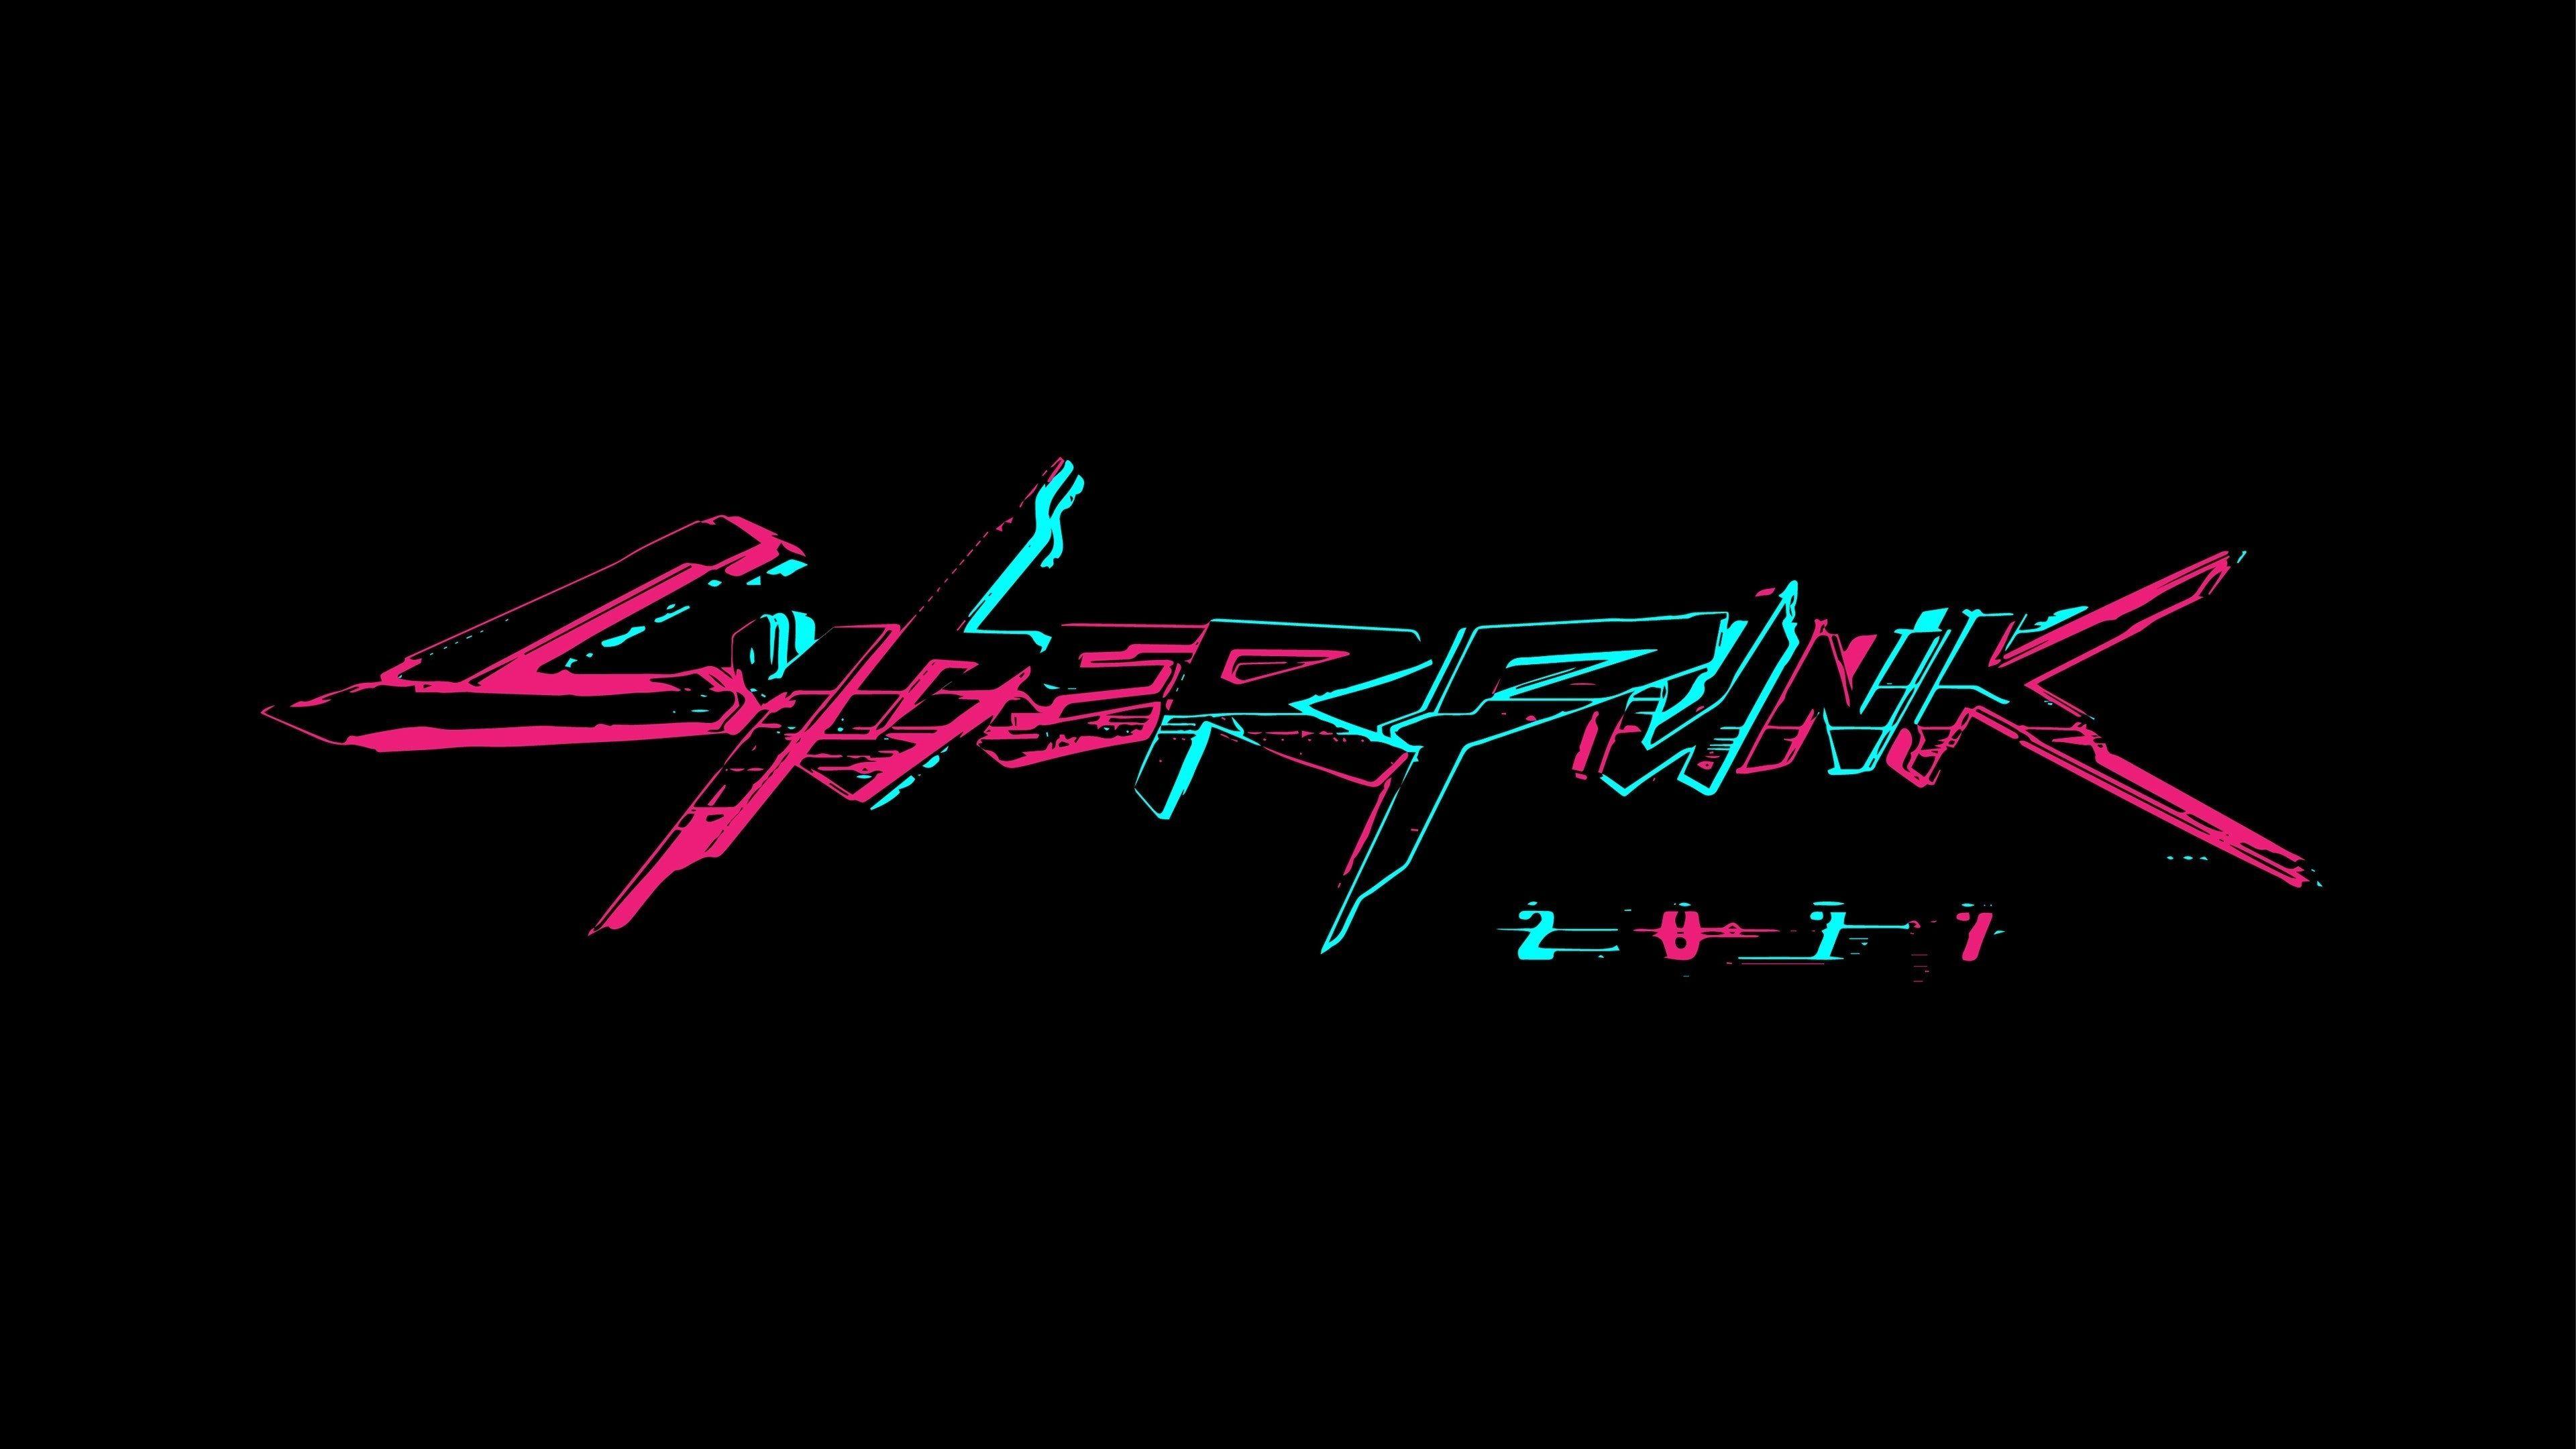 Cyberpunk Neon 4k Wallpaper Cyberpunk 2077 Cyberpunk Neon Wallpaper